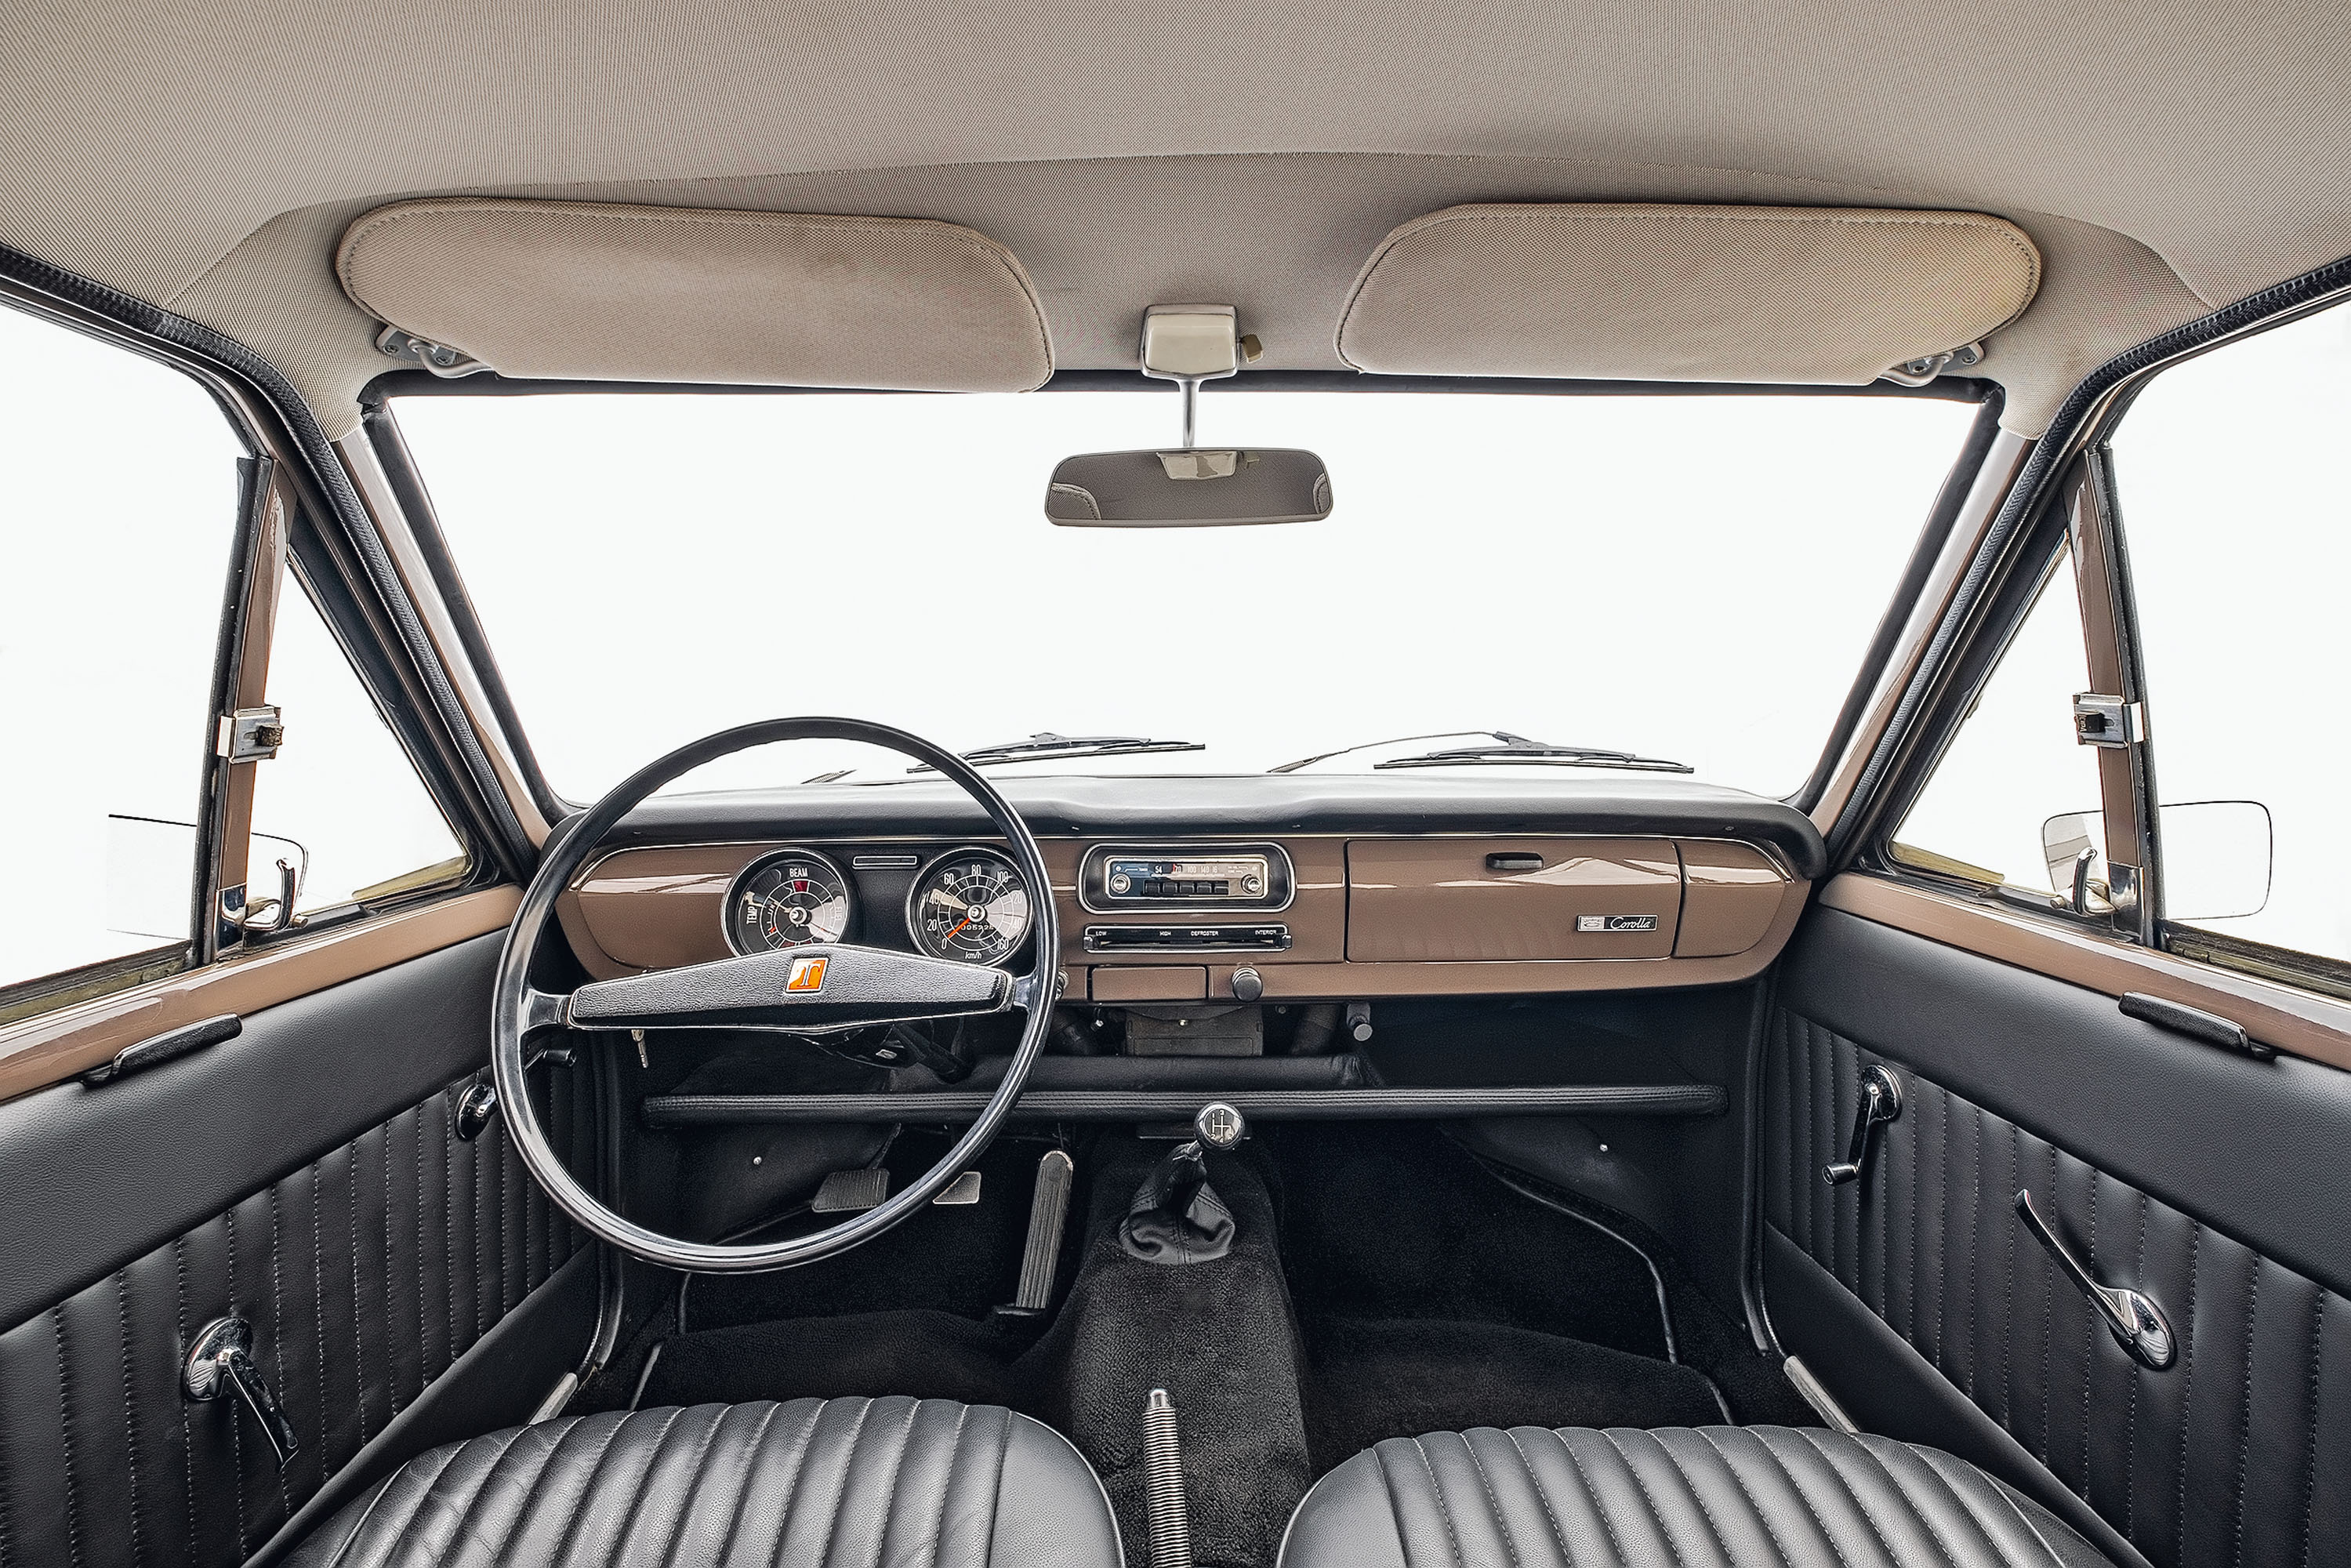 Toyota Corolla 1968 - clássicos QUATRO RODAS.